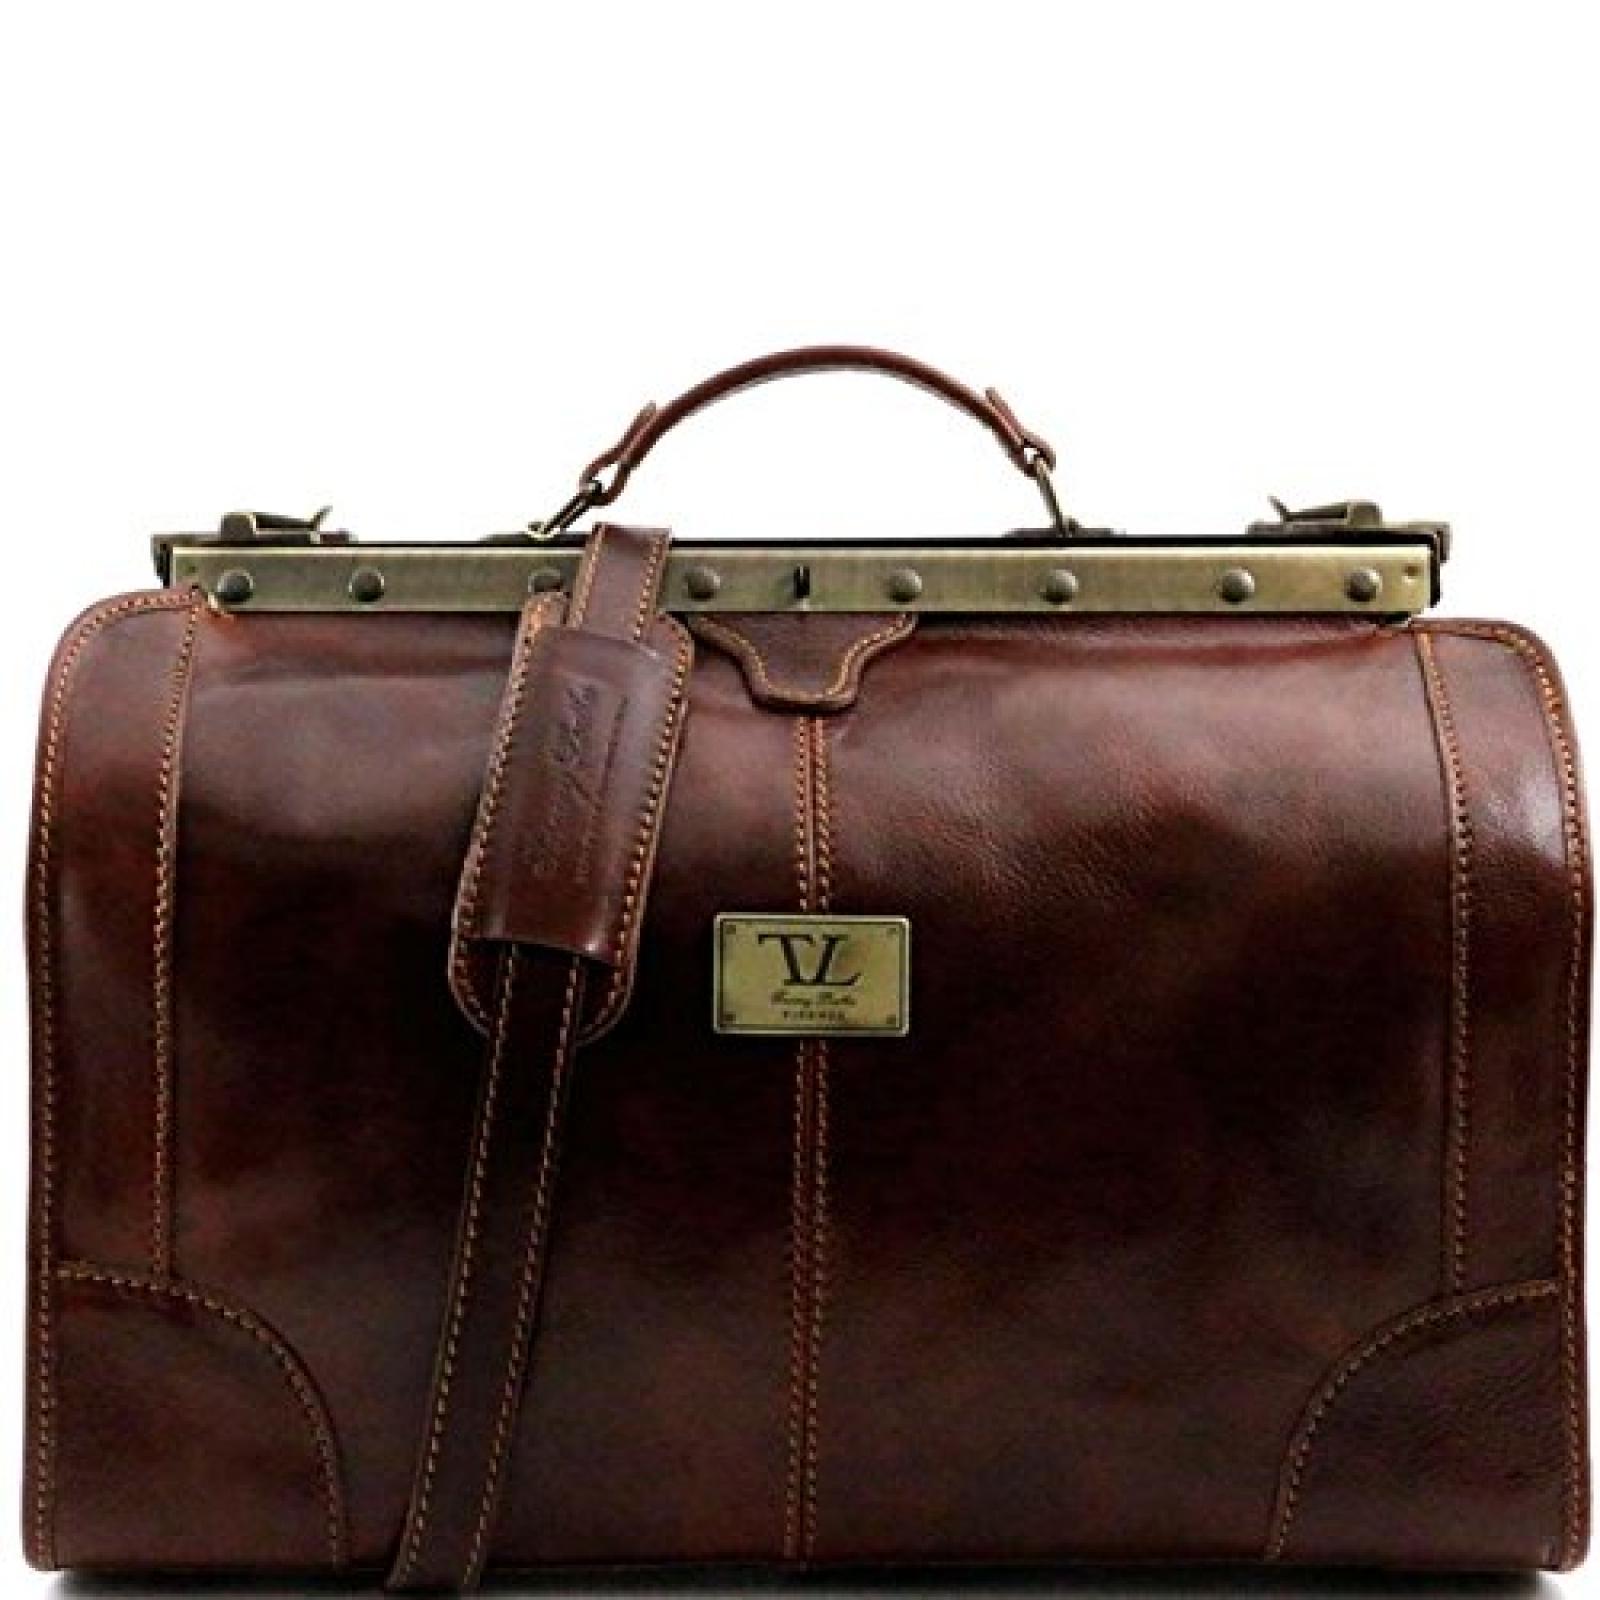 Tuscany Leather - Madrid - Maulbügelreisetasche aus Leder - Klein Braun - TL1023/1